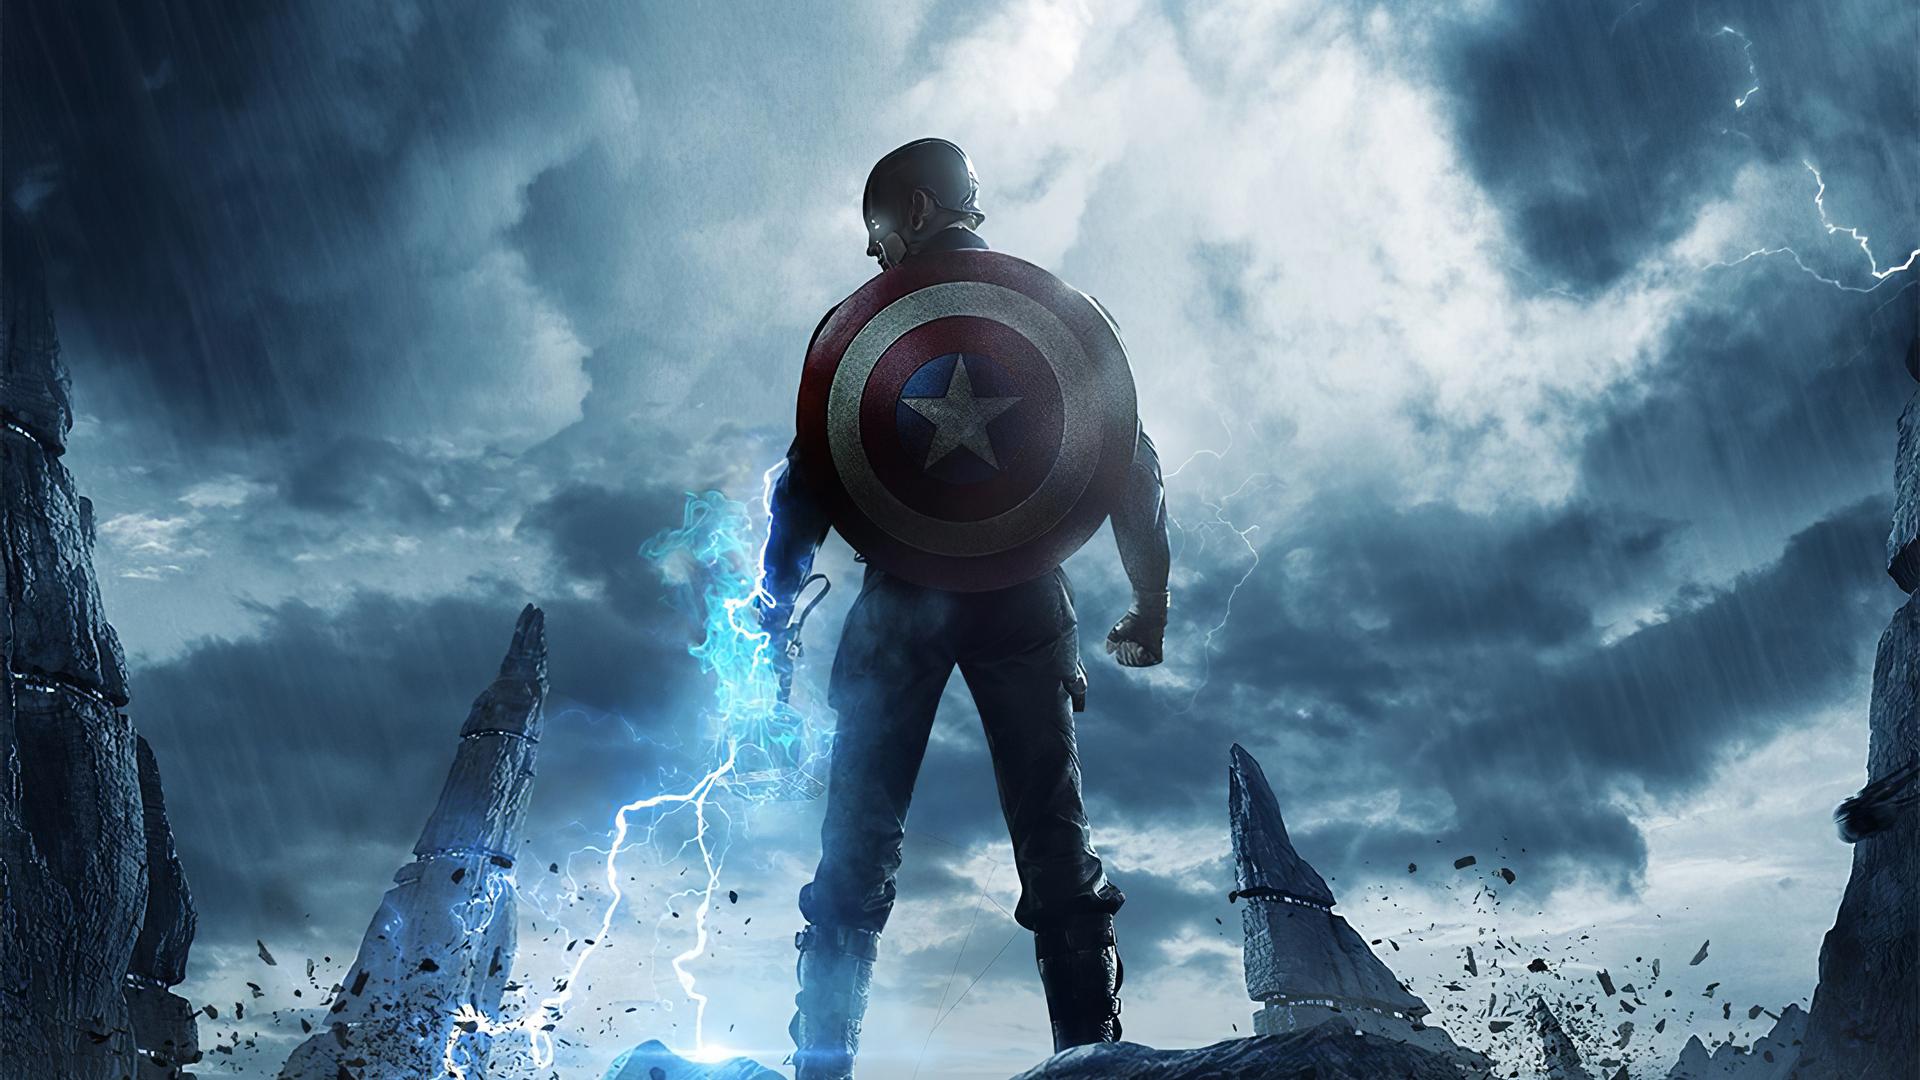 1920x1080 Captain America 4k 2020 Laptop Full HD 1080P HD ...